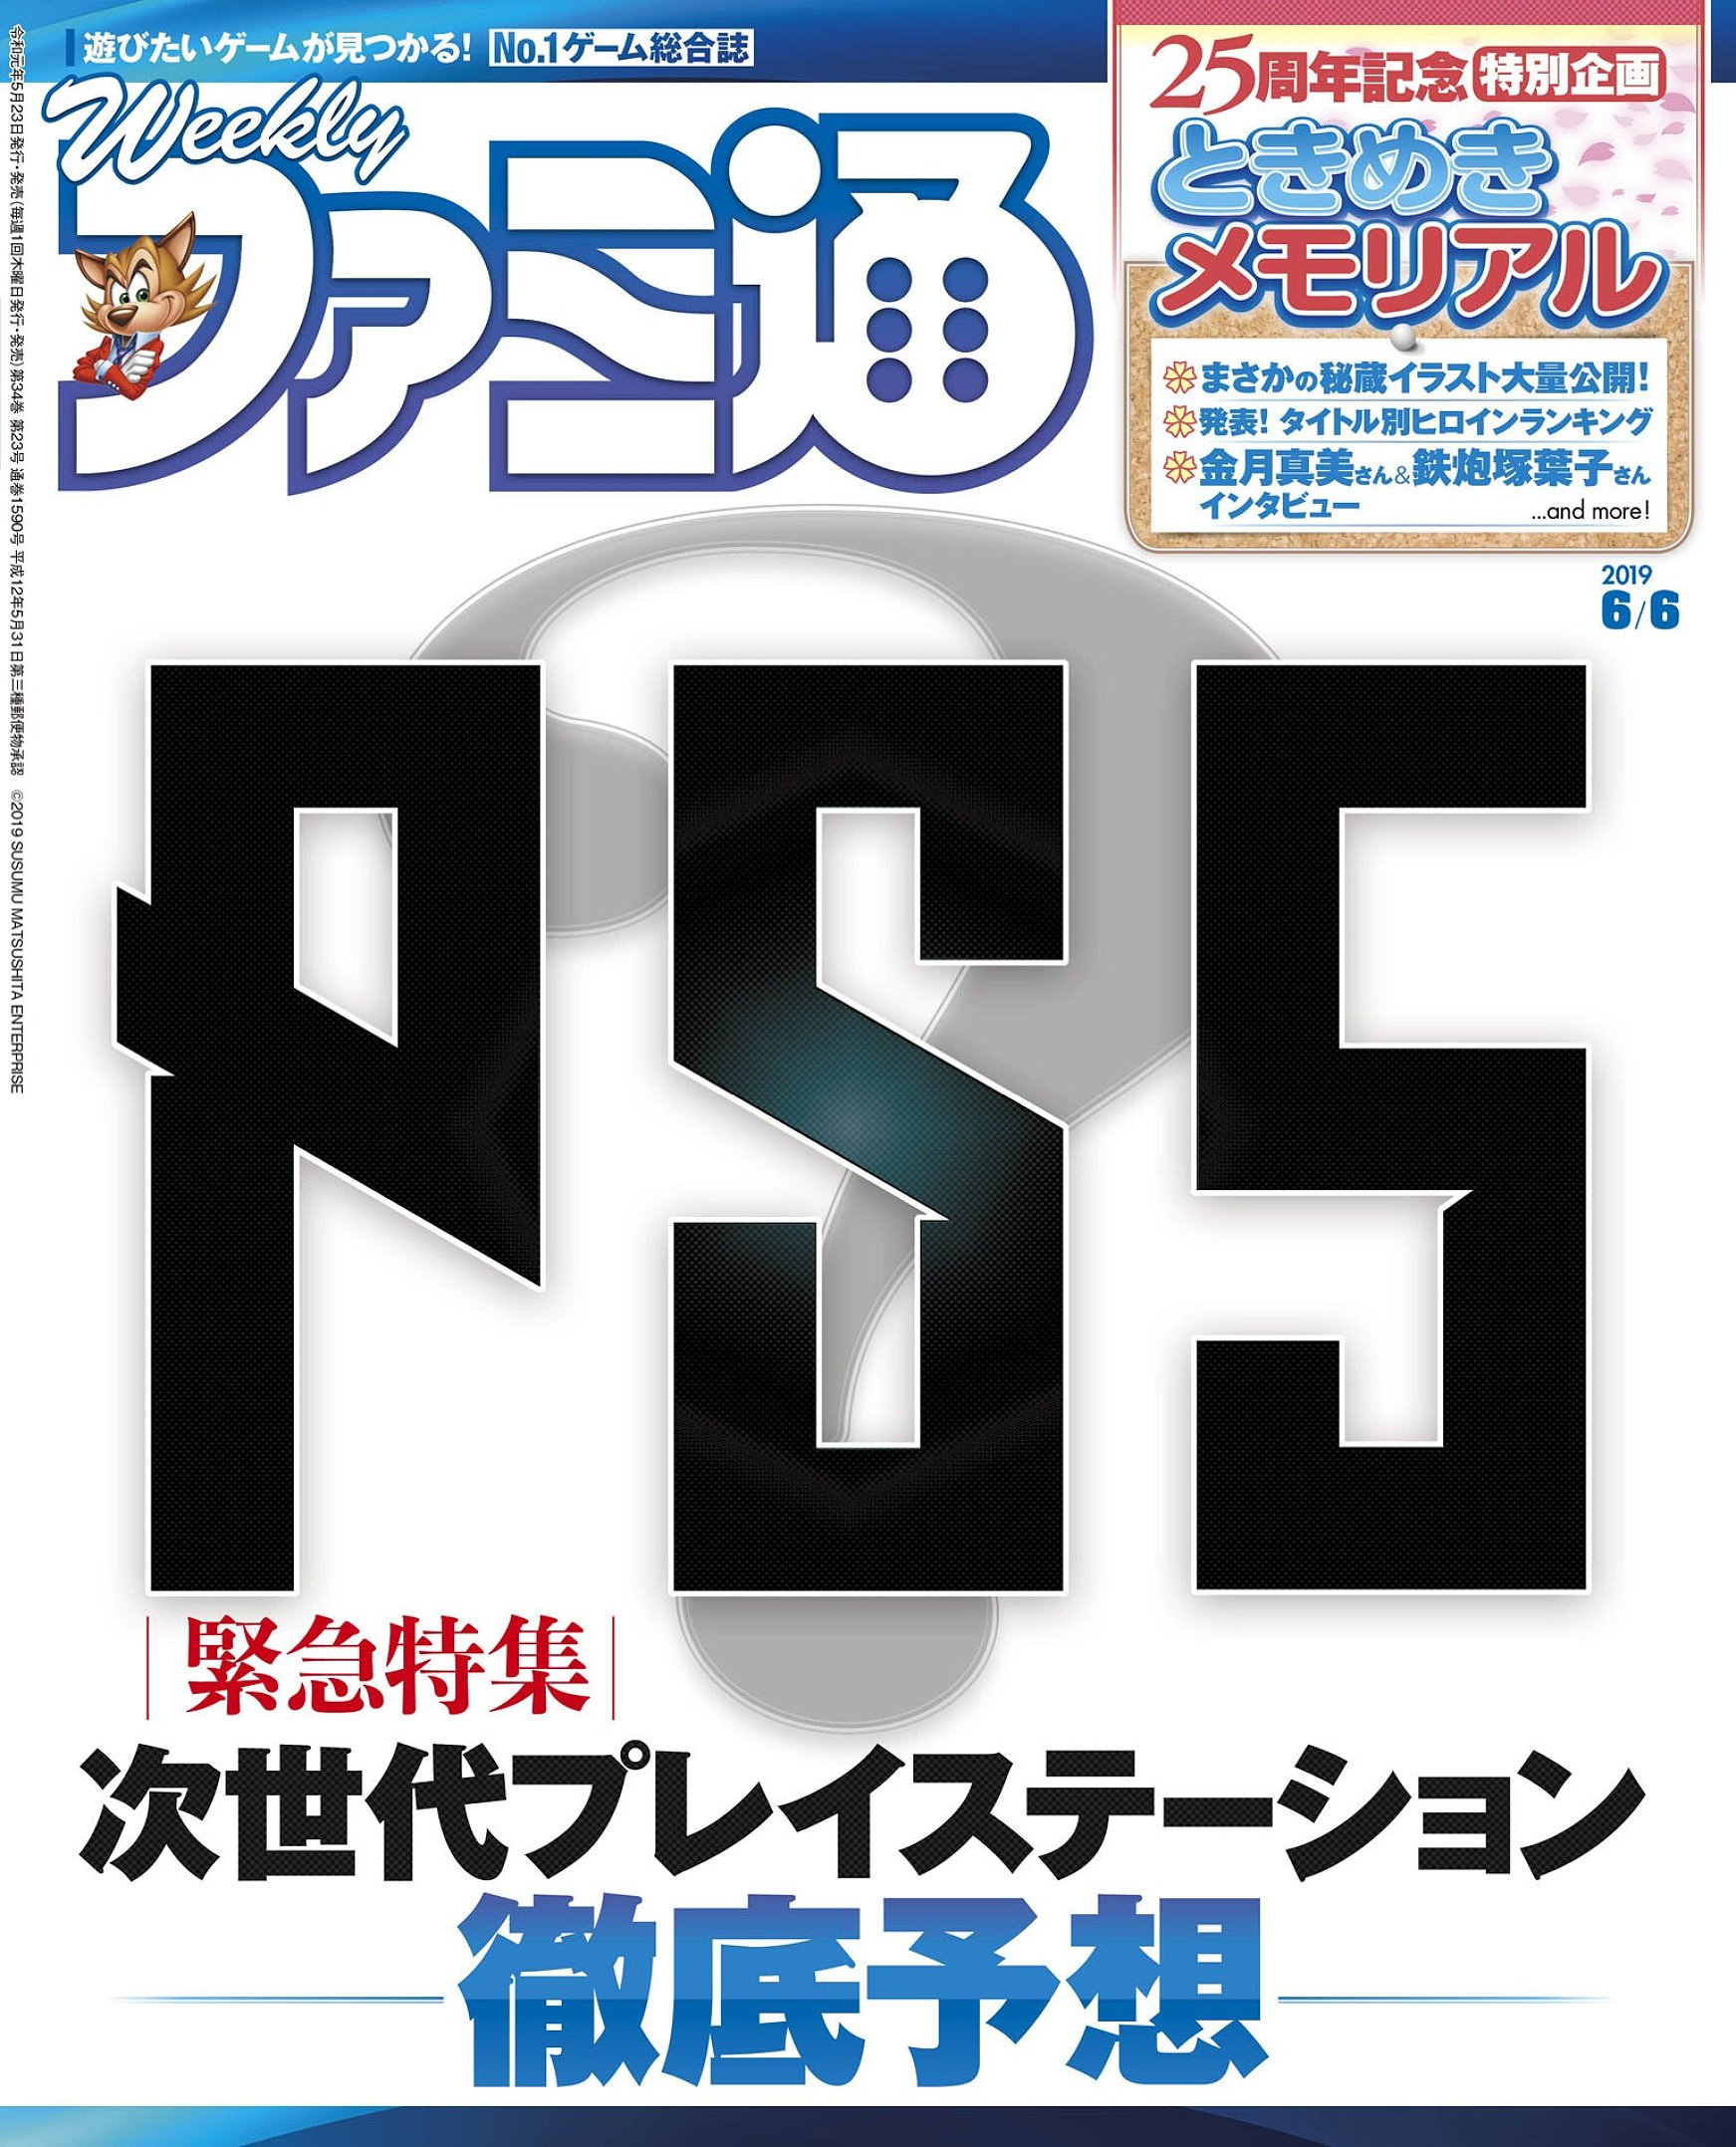 Famitsu 1590 (June 6, 2019)